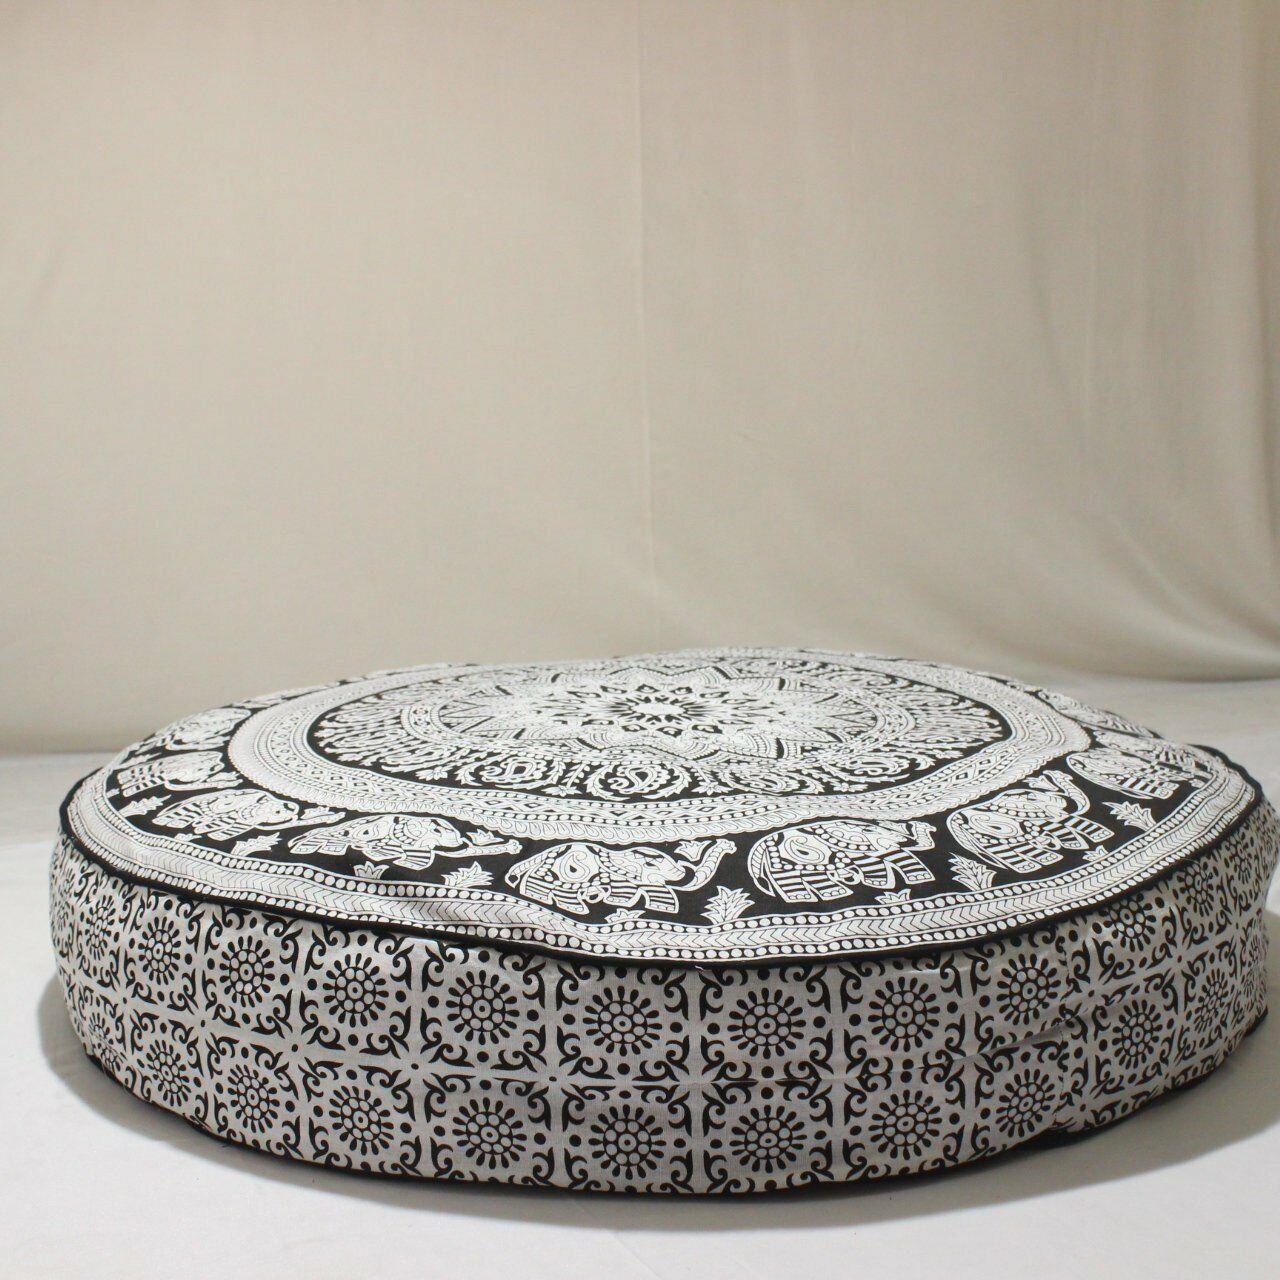 Worldwideretailers Blue Mandala Floor Pillow Cushion Seating Throw Cover Hippie Decorative Bohemian Boho Indian 32